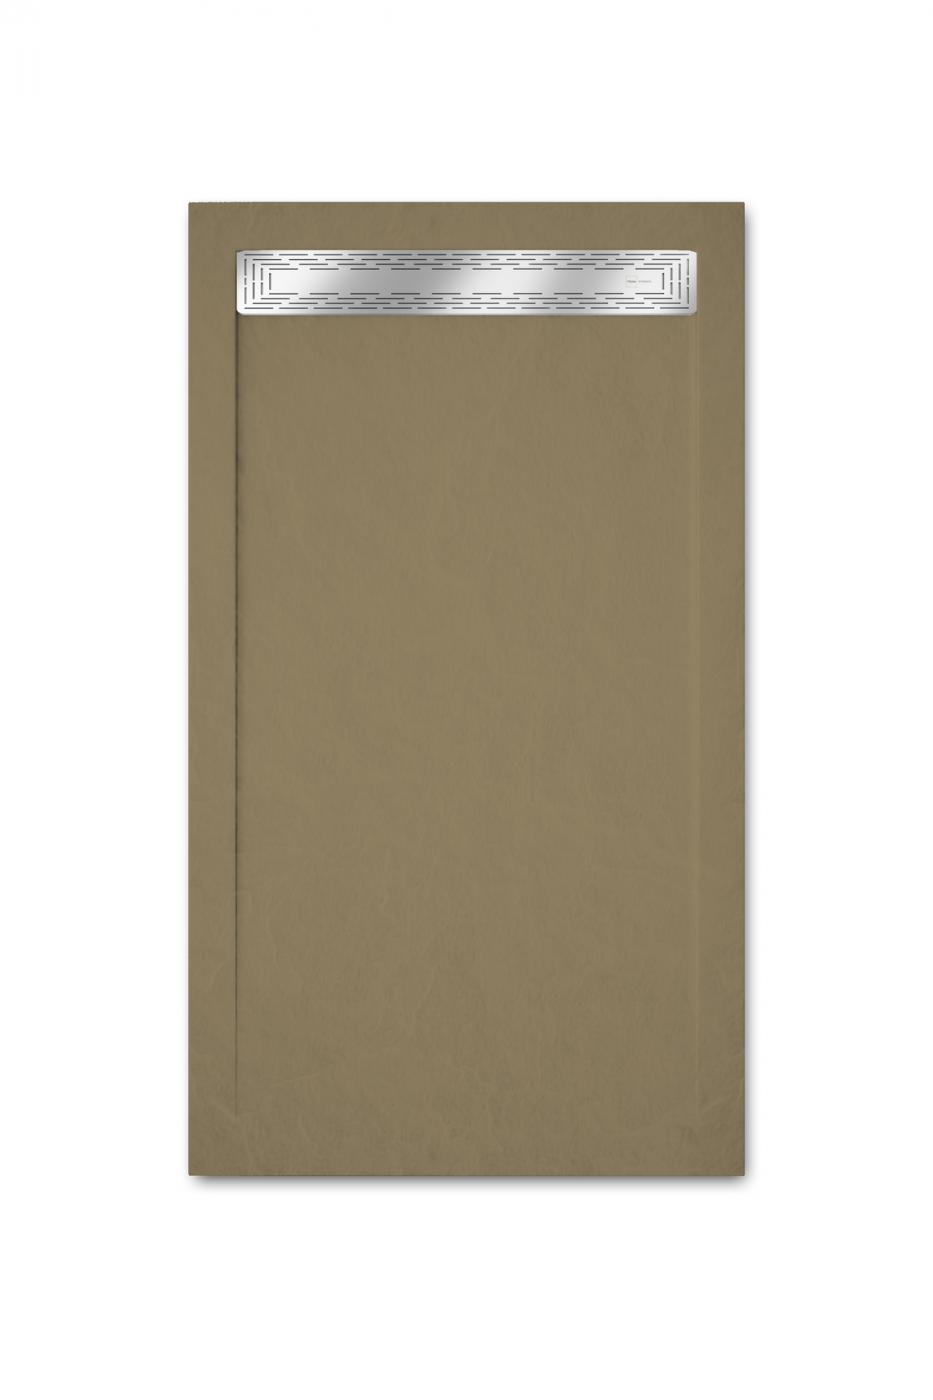 Plato de ducha XL - ancho 70cm